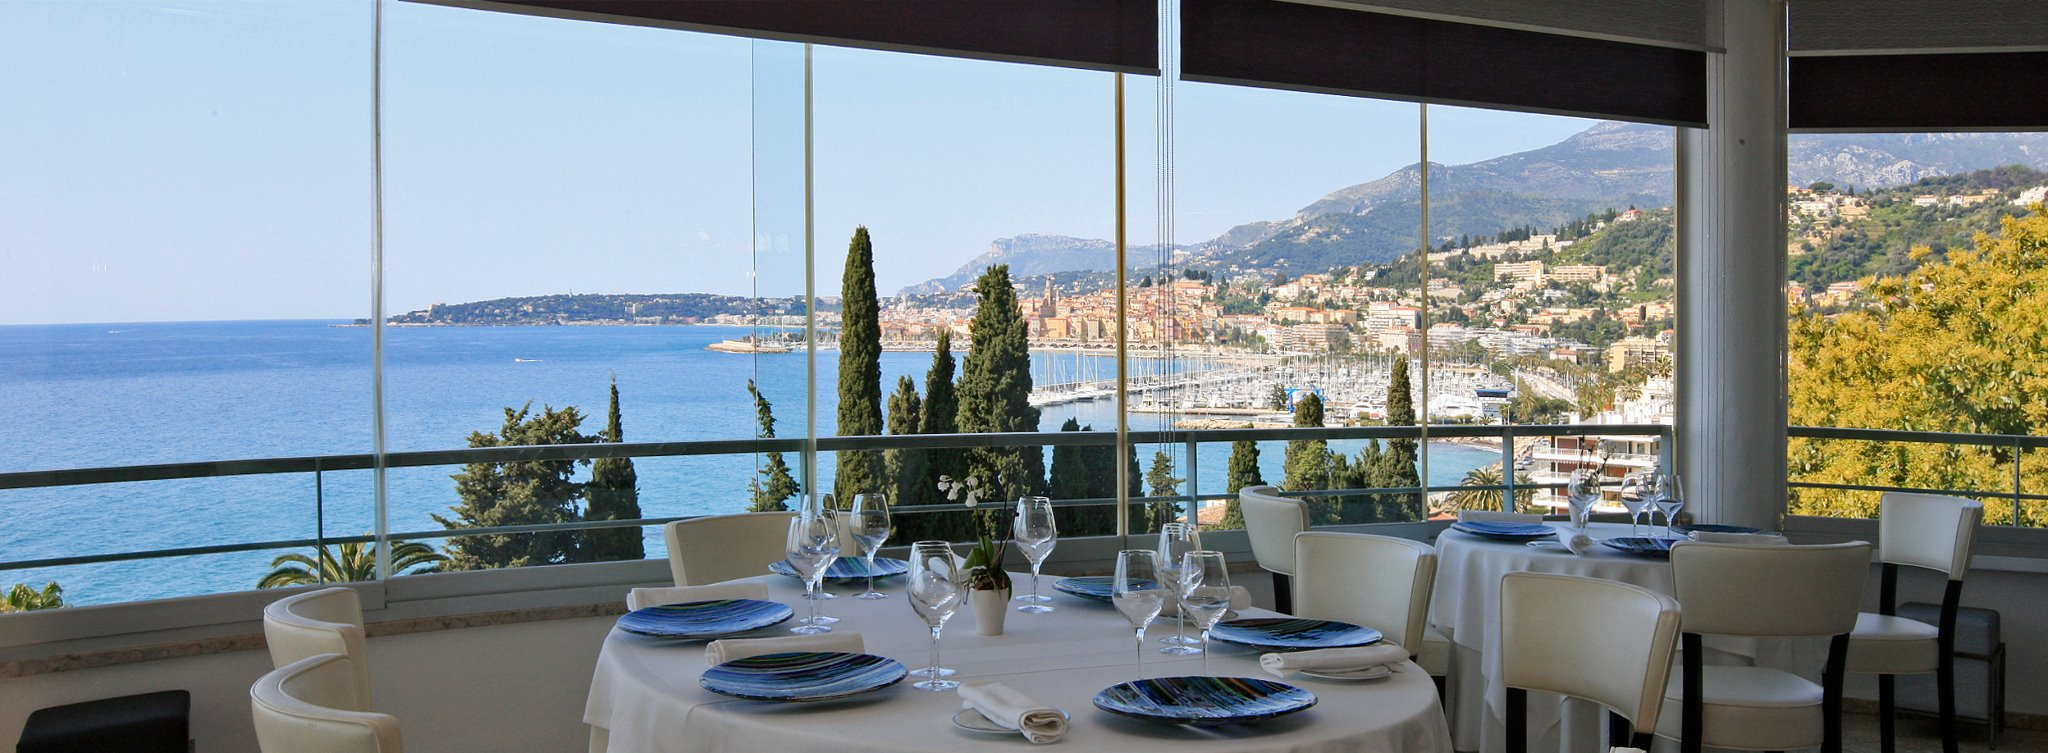 restaurante-mirazur-costa-azul-francia